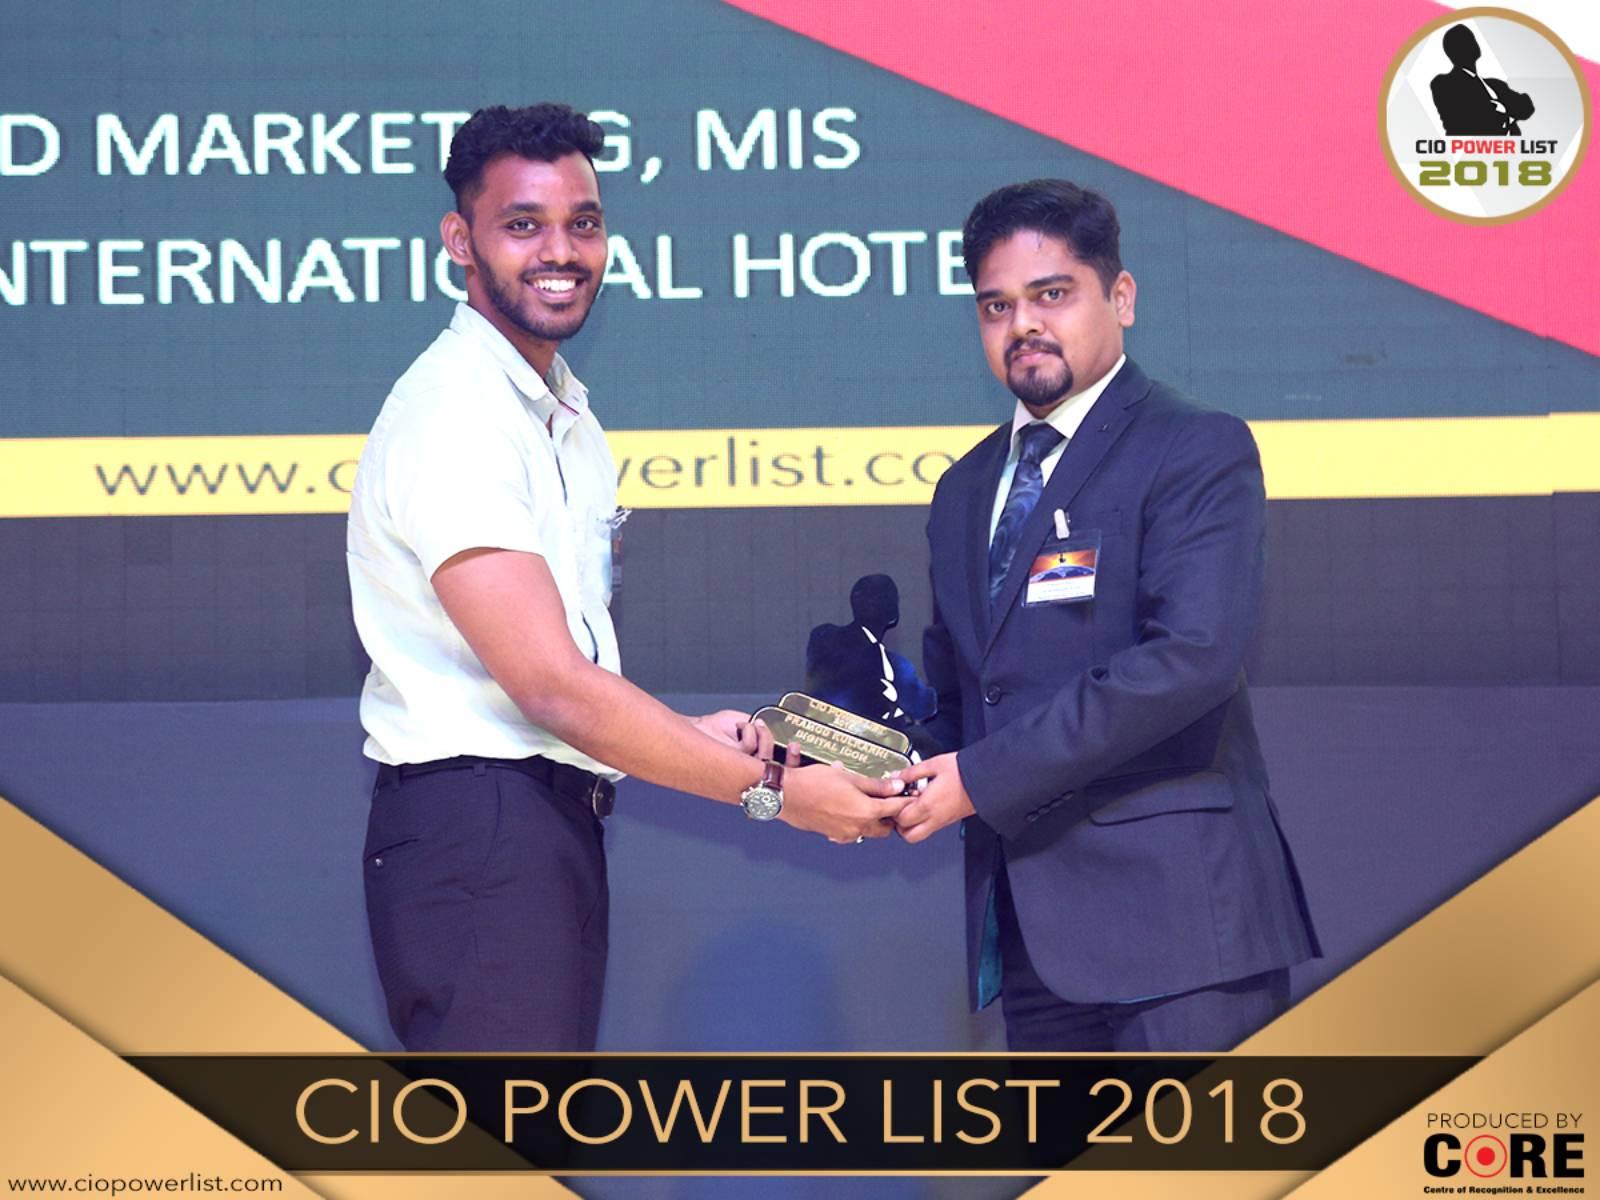 PRAMOD KULKARNI - The Ambassador   Heritage Hotels in Mumbai, Aurangabad, Chennai - Pramod Kulkarni recognised as Digital Icon At CIO Power List 2018 by Core Media